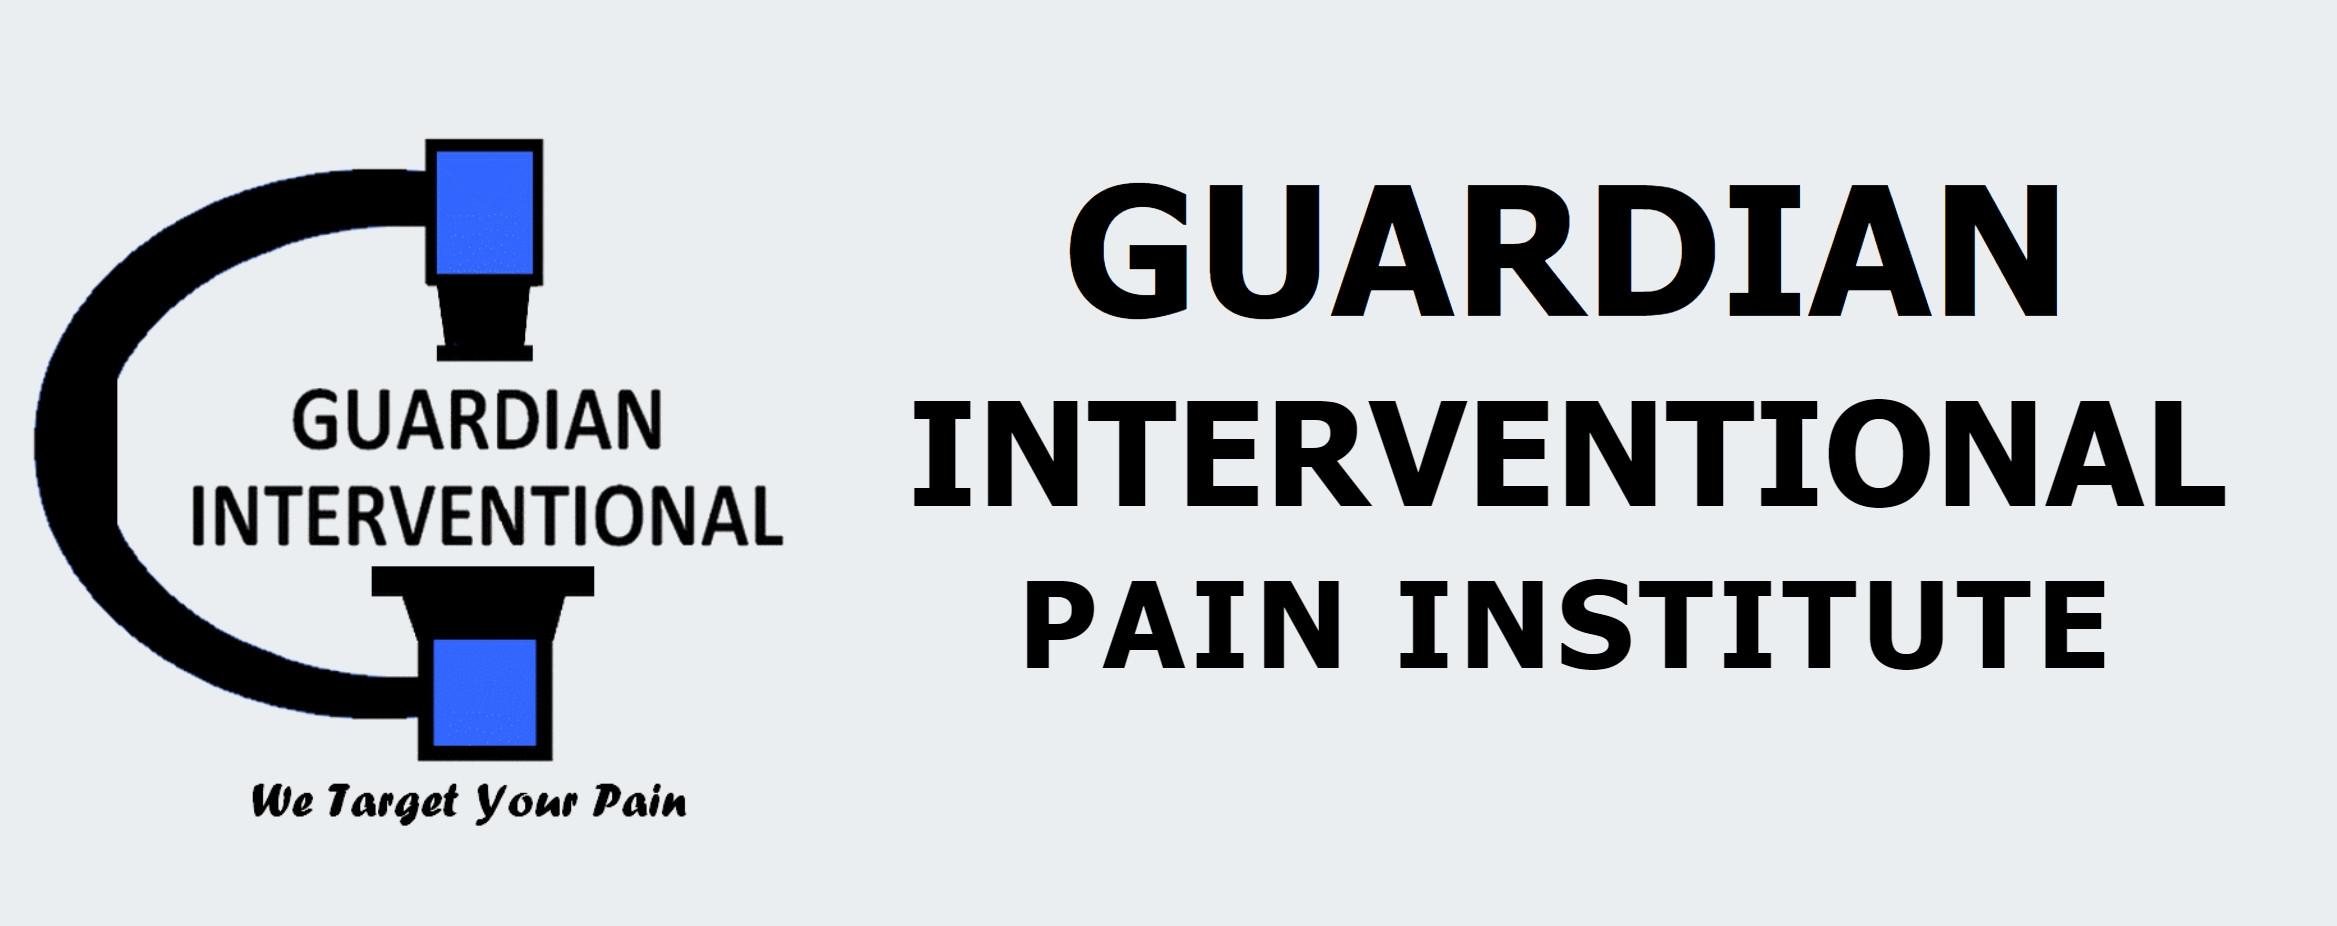 Decatur Il Mall >> Home|Pain decatur IL|Guardian Interventional Pain Institute